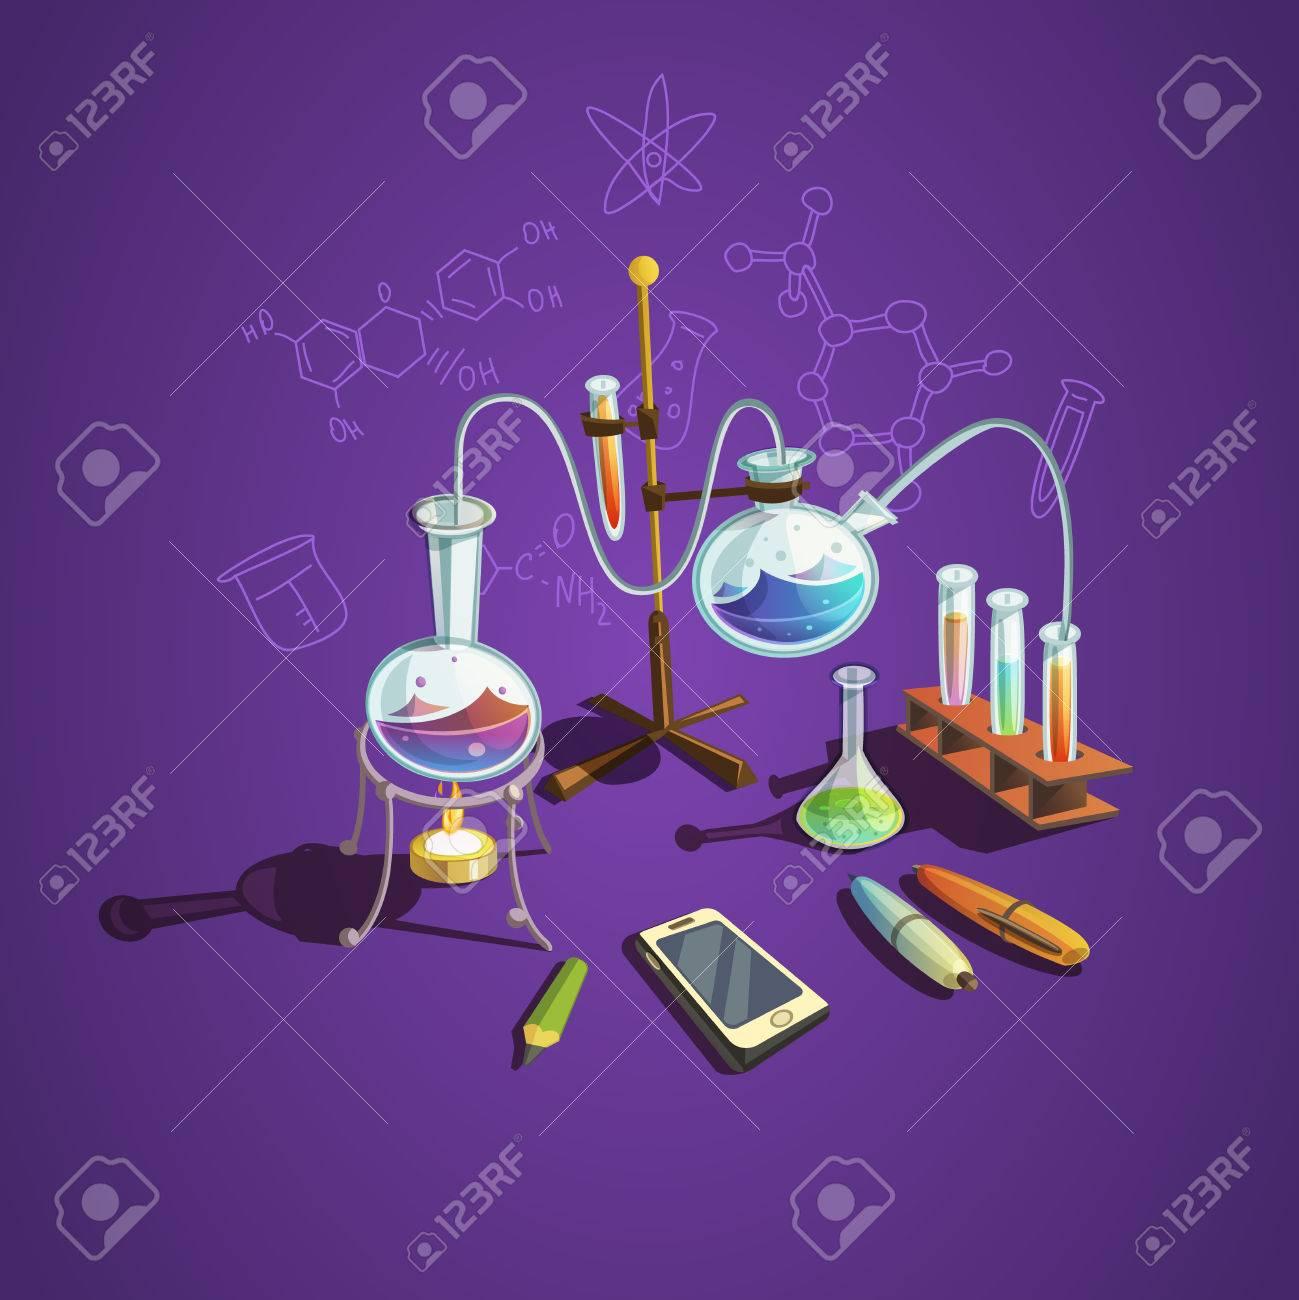 Chemistry science concept with retro cartoon scientific lab items vector illustration - 51142989